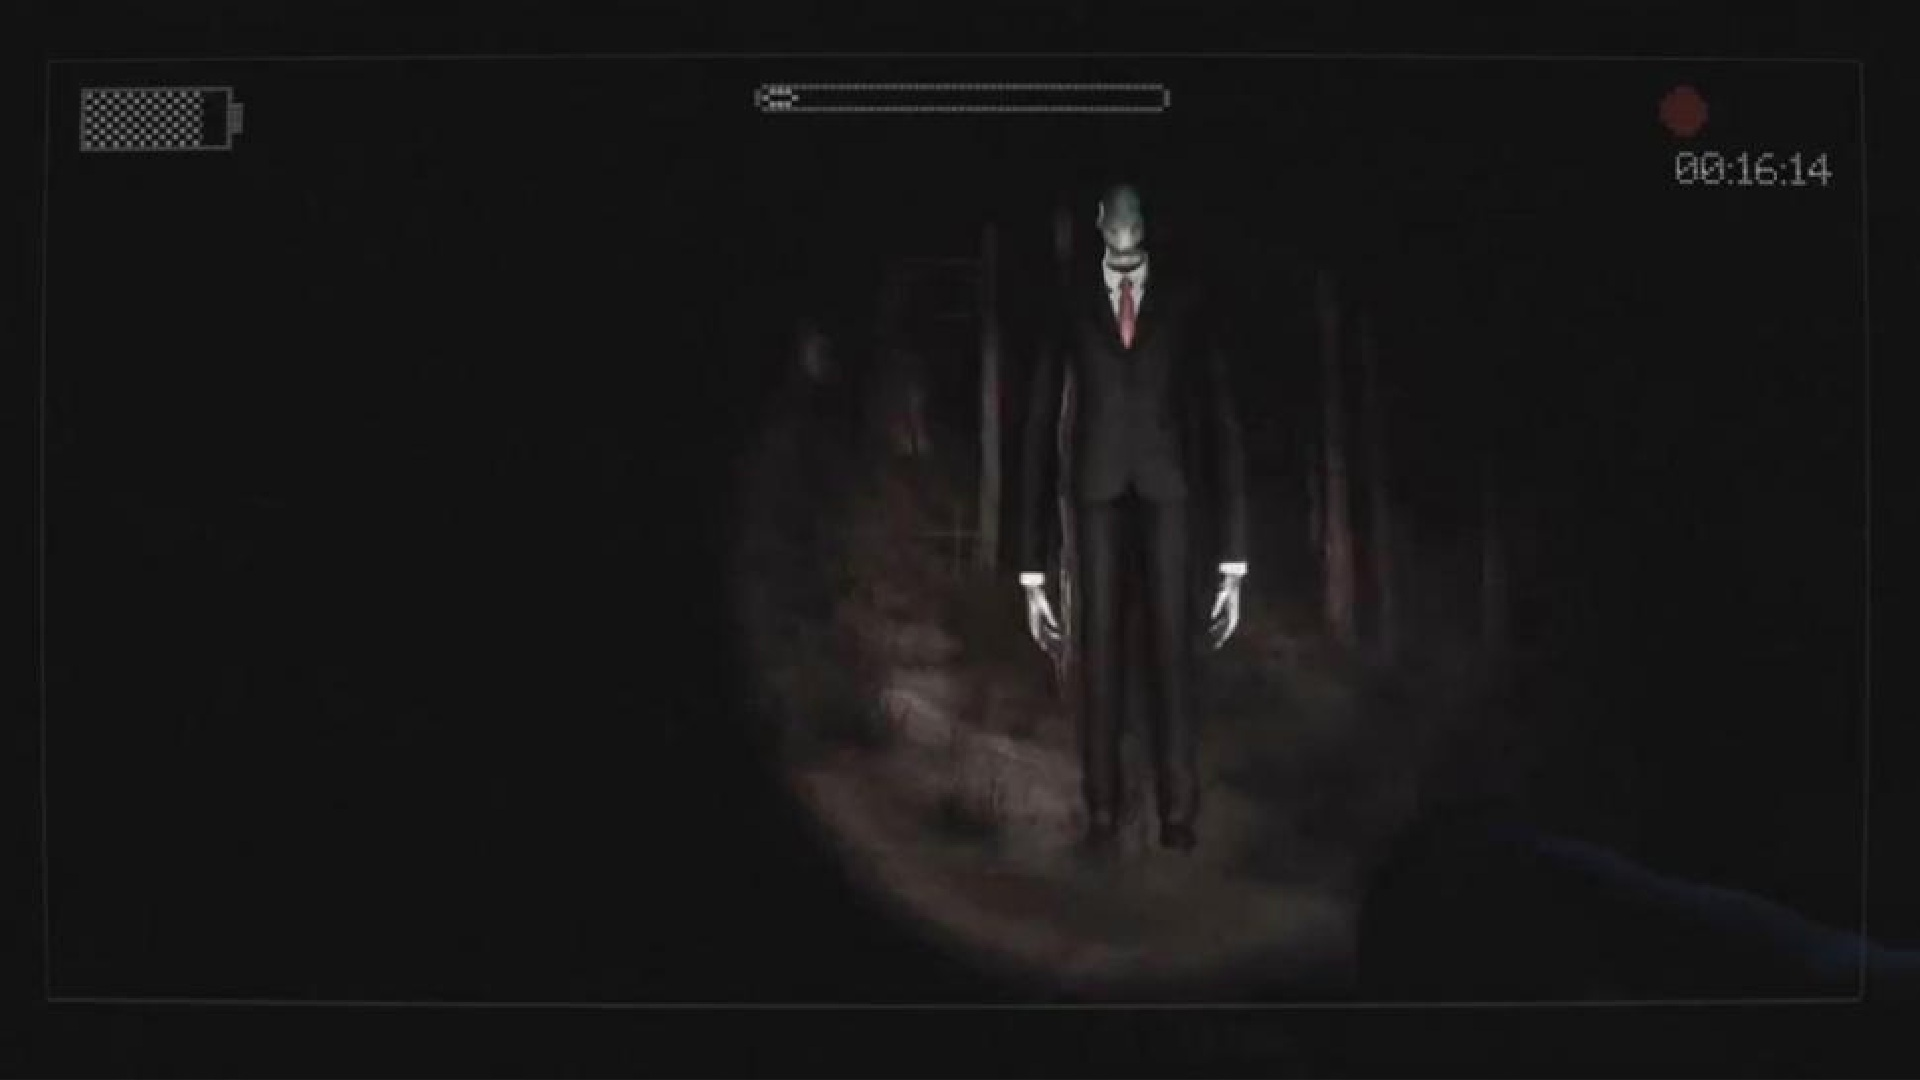 http://img2.wikia.nocookie.net/__cb20130612205355/theslenderman/images/2/2f/Slender-The-Arrival-Teaser-Trailer_9.jpg